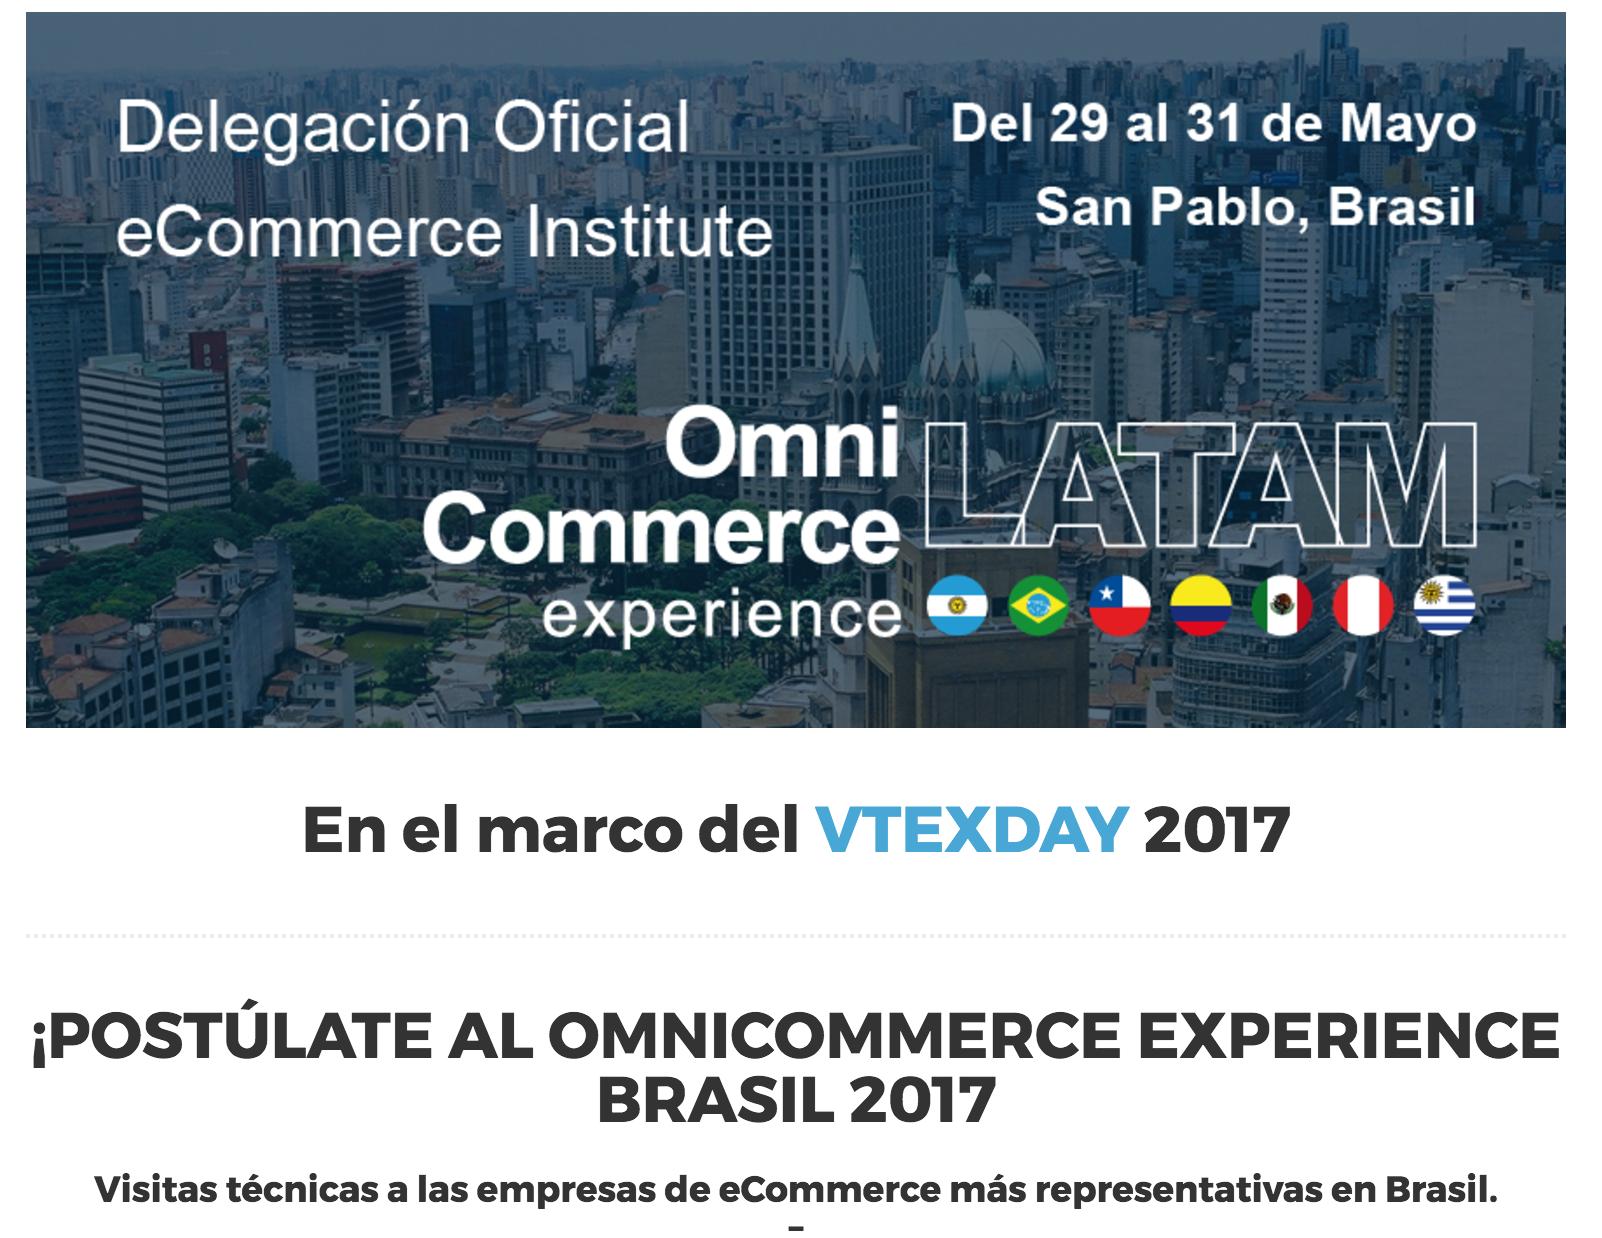 Omnicommerce Experience Brasil 2017 en el marco del VTEXDAY 2017